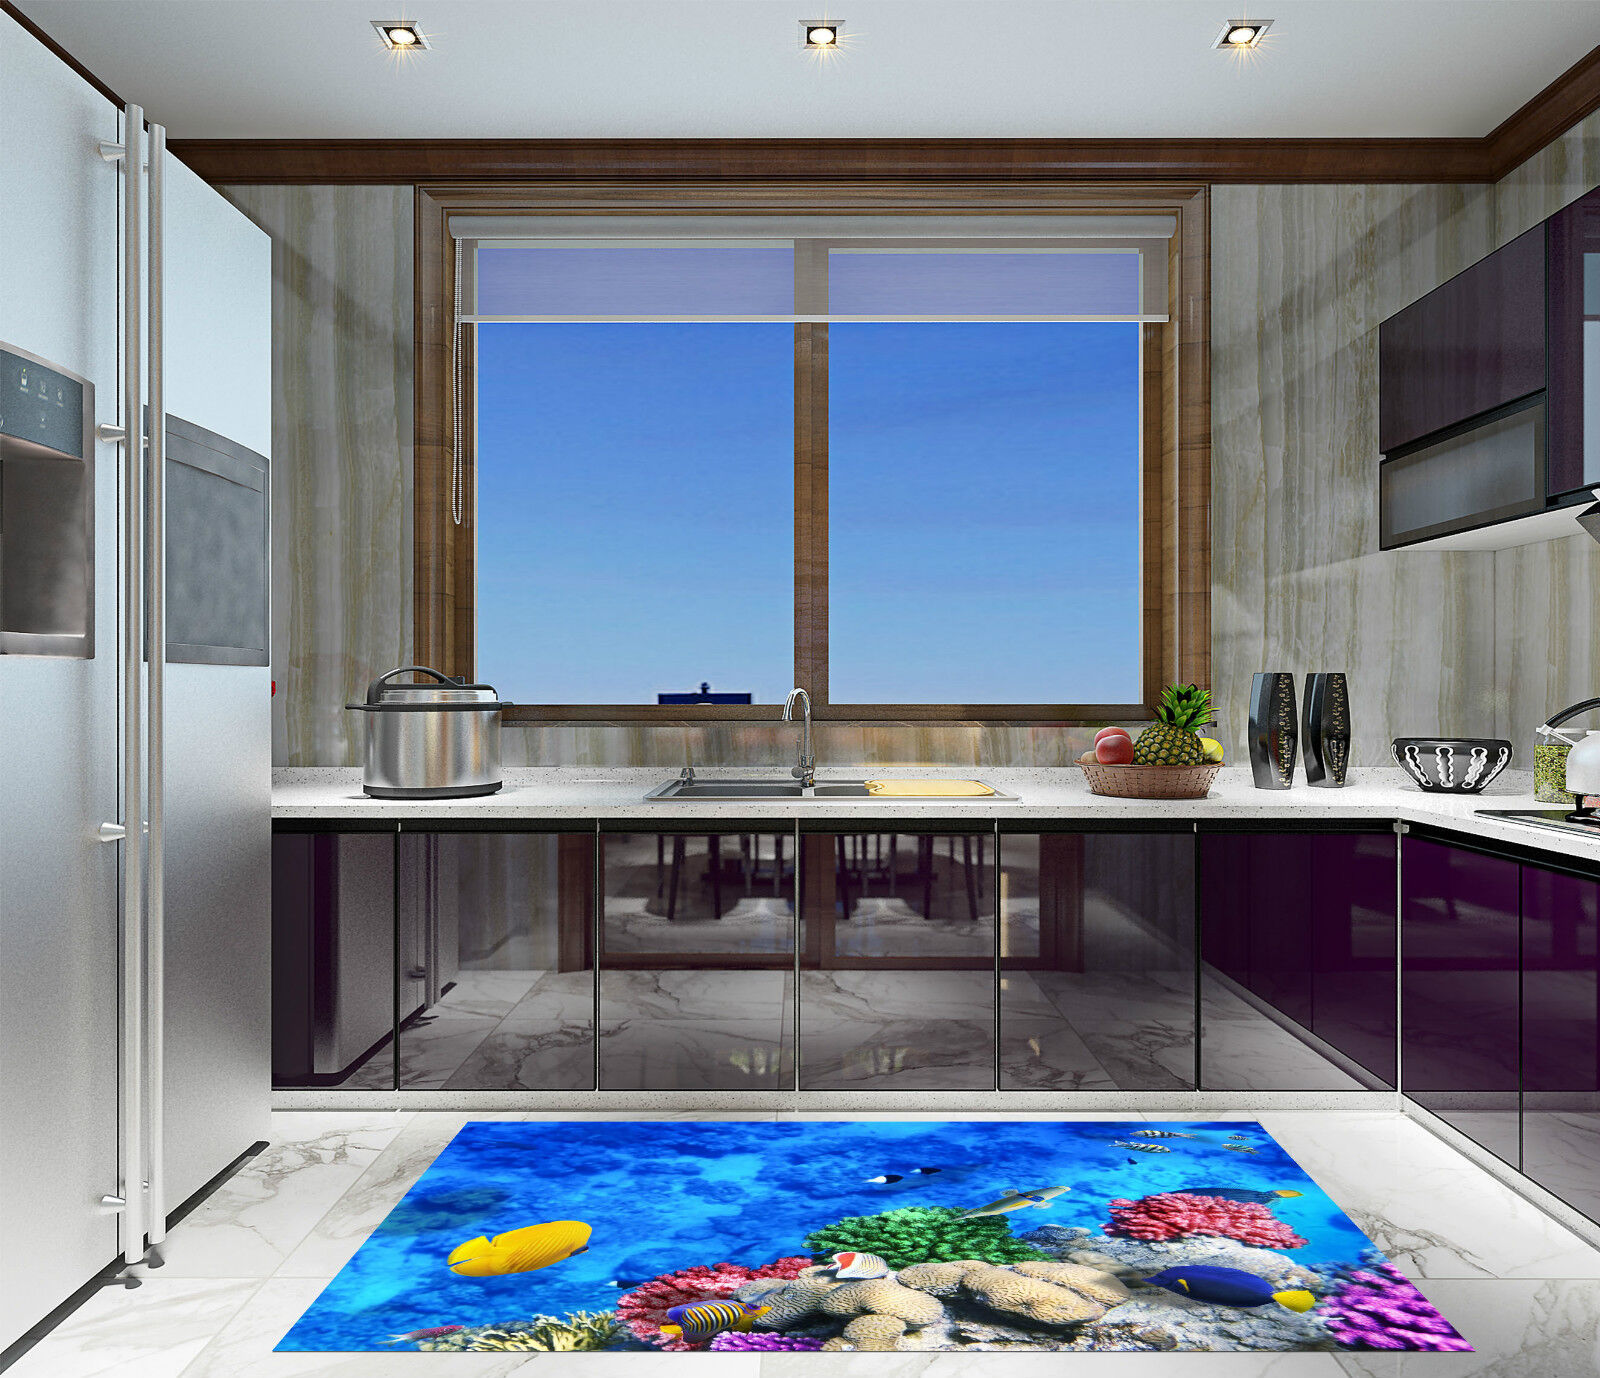 3D Beaux Fonds Fonds Beaux Marins 107 Décor Mural Murale De Mur De Cuisine AJ WALLPAPER FR f477a5